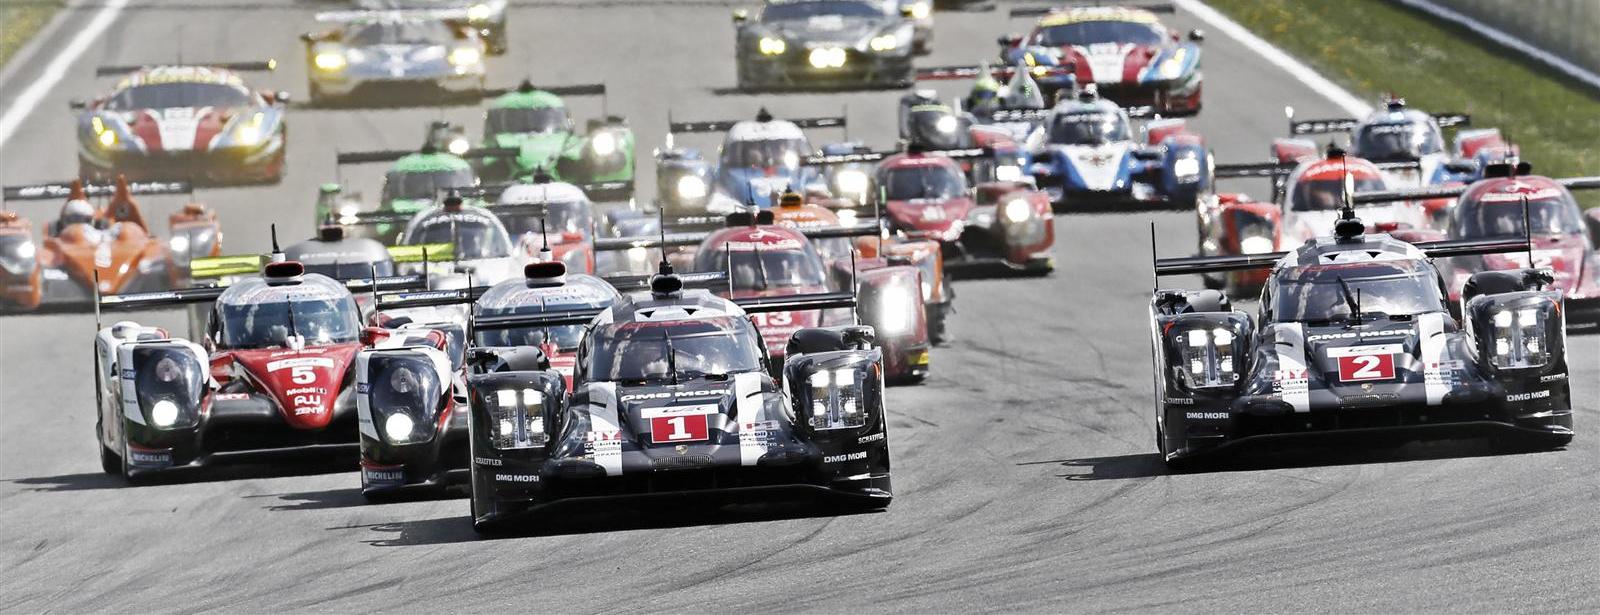 Porsche - Thriller - FIA WEC 6h of Spa-Francorchamps 2016